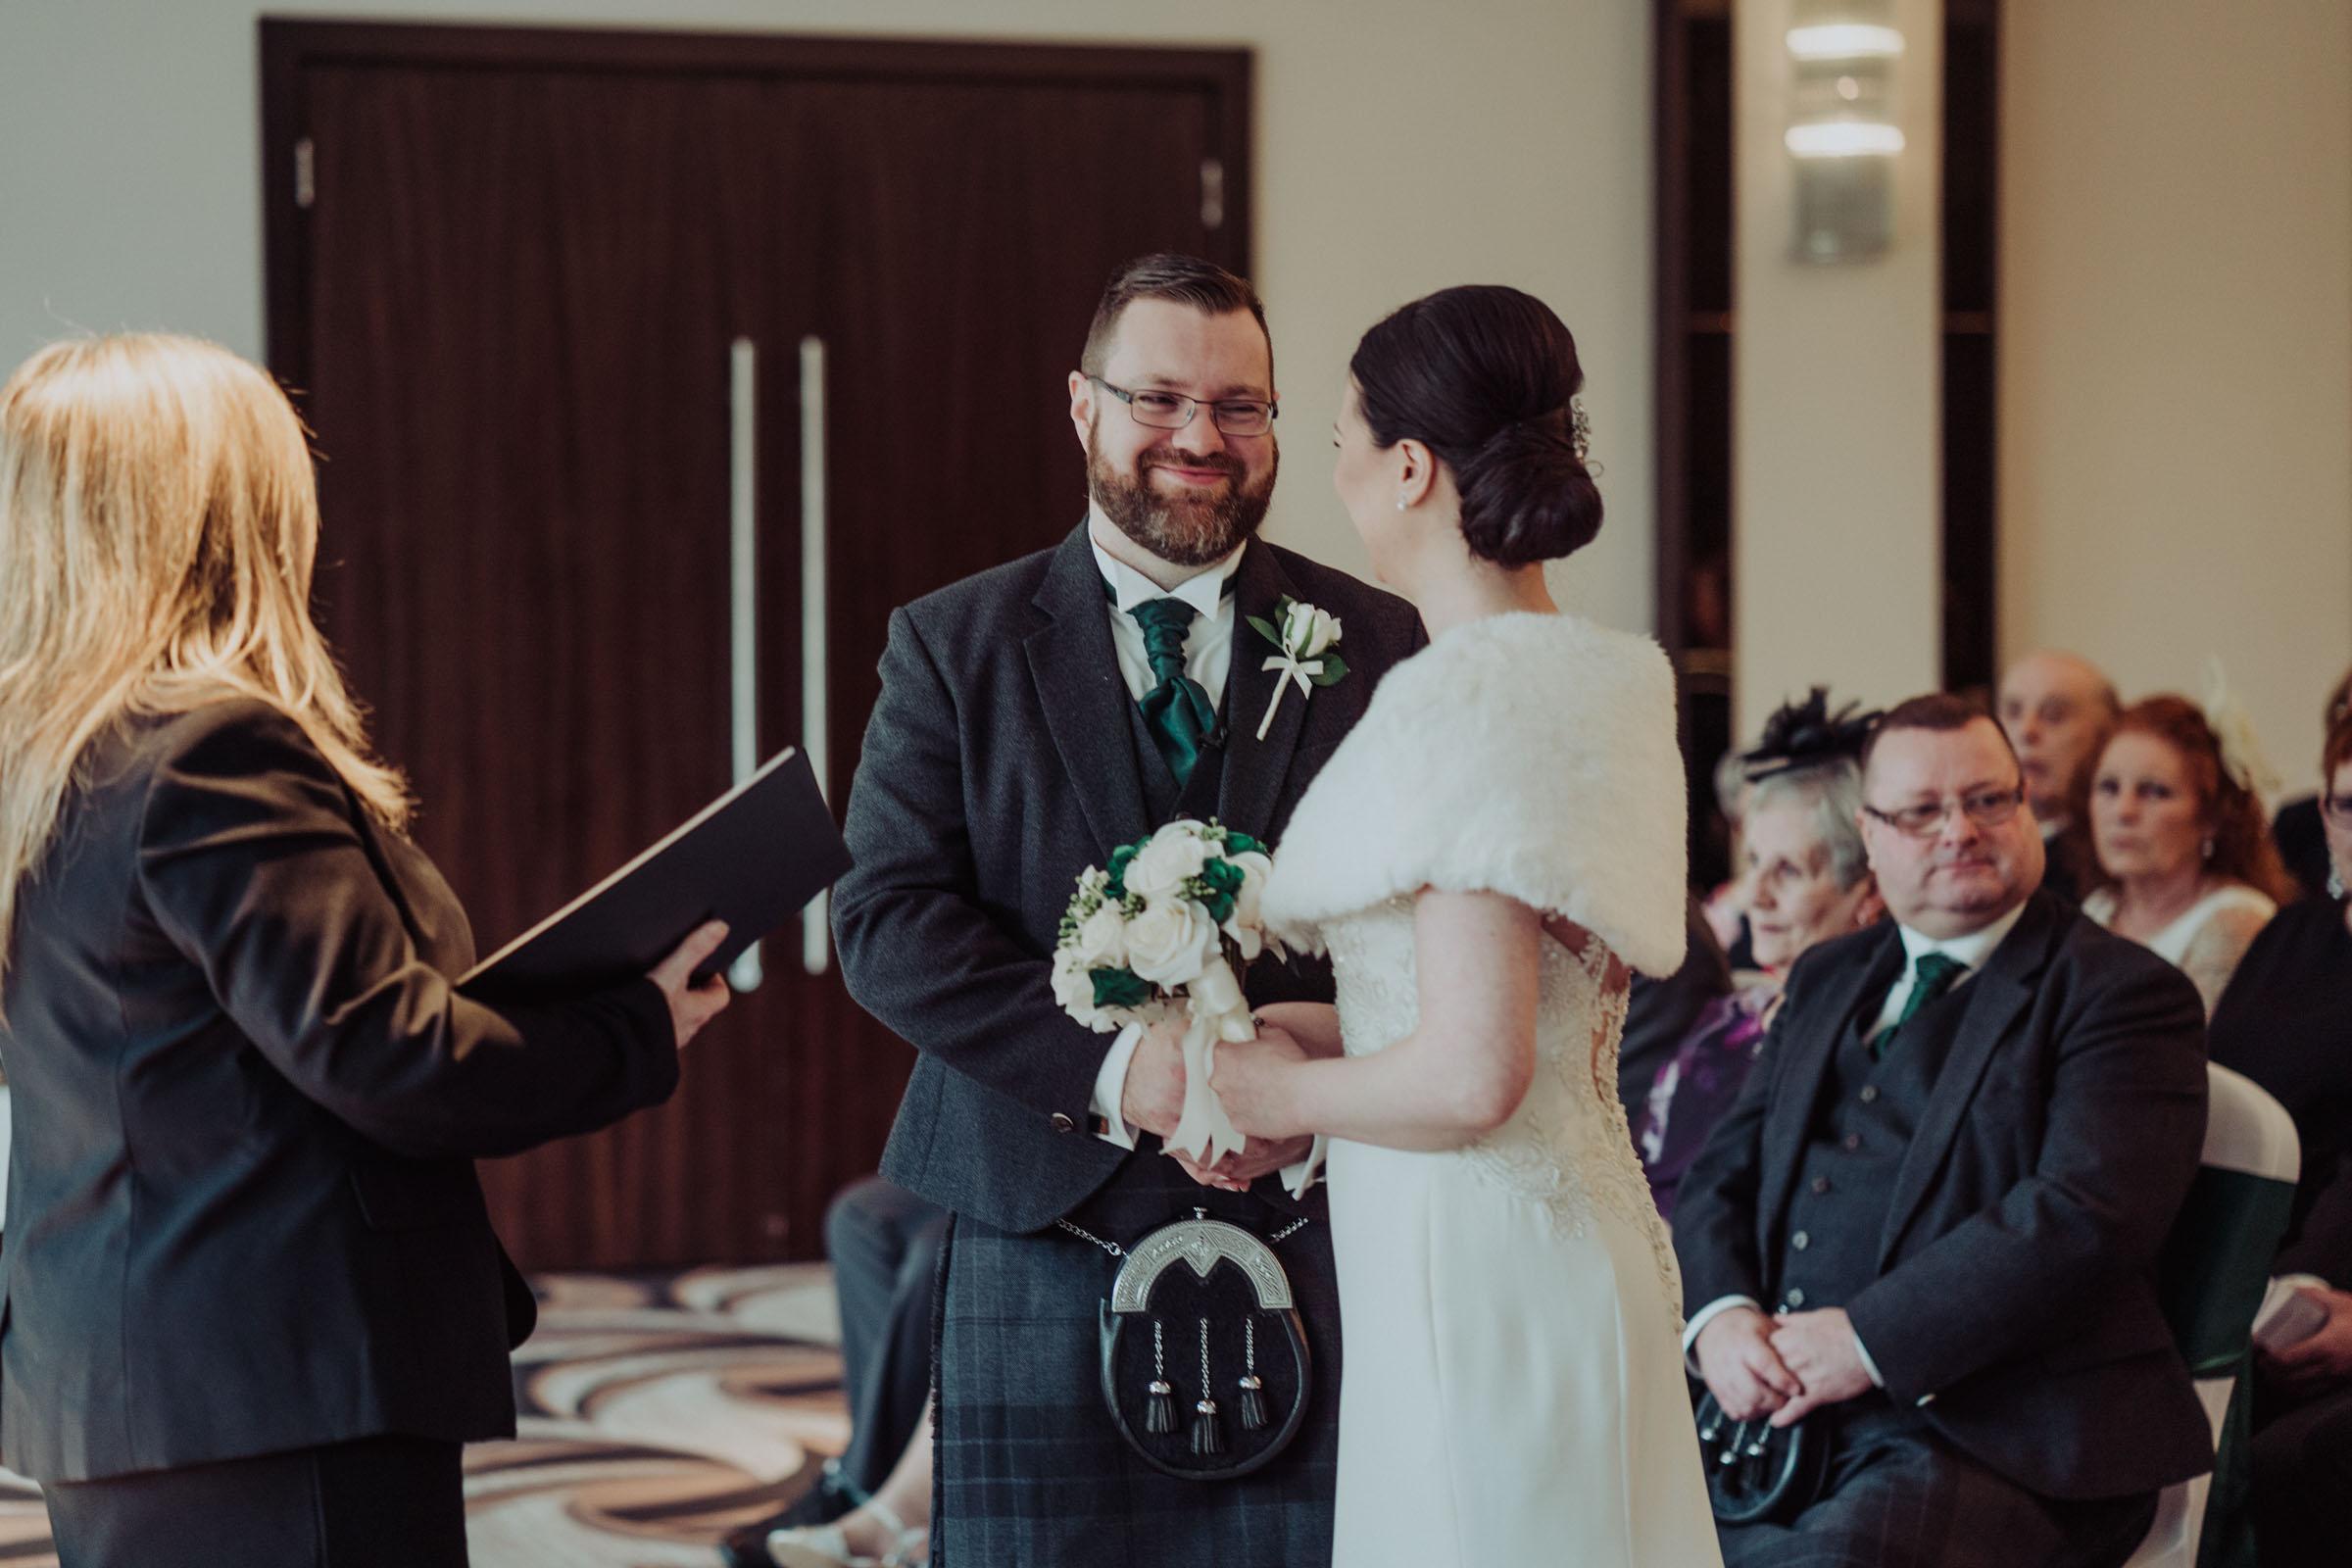 Radstone-Wedding-Dearly-Photography-Scotland (14 of 50).jpg